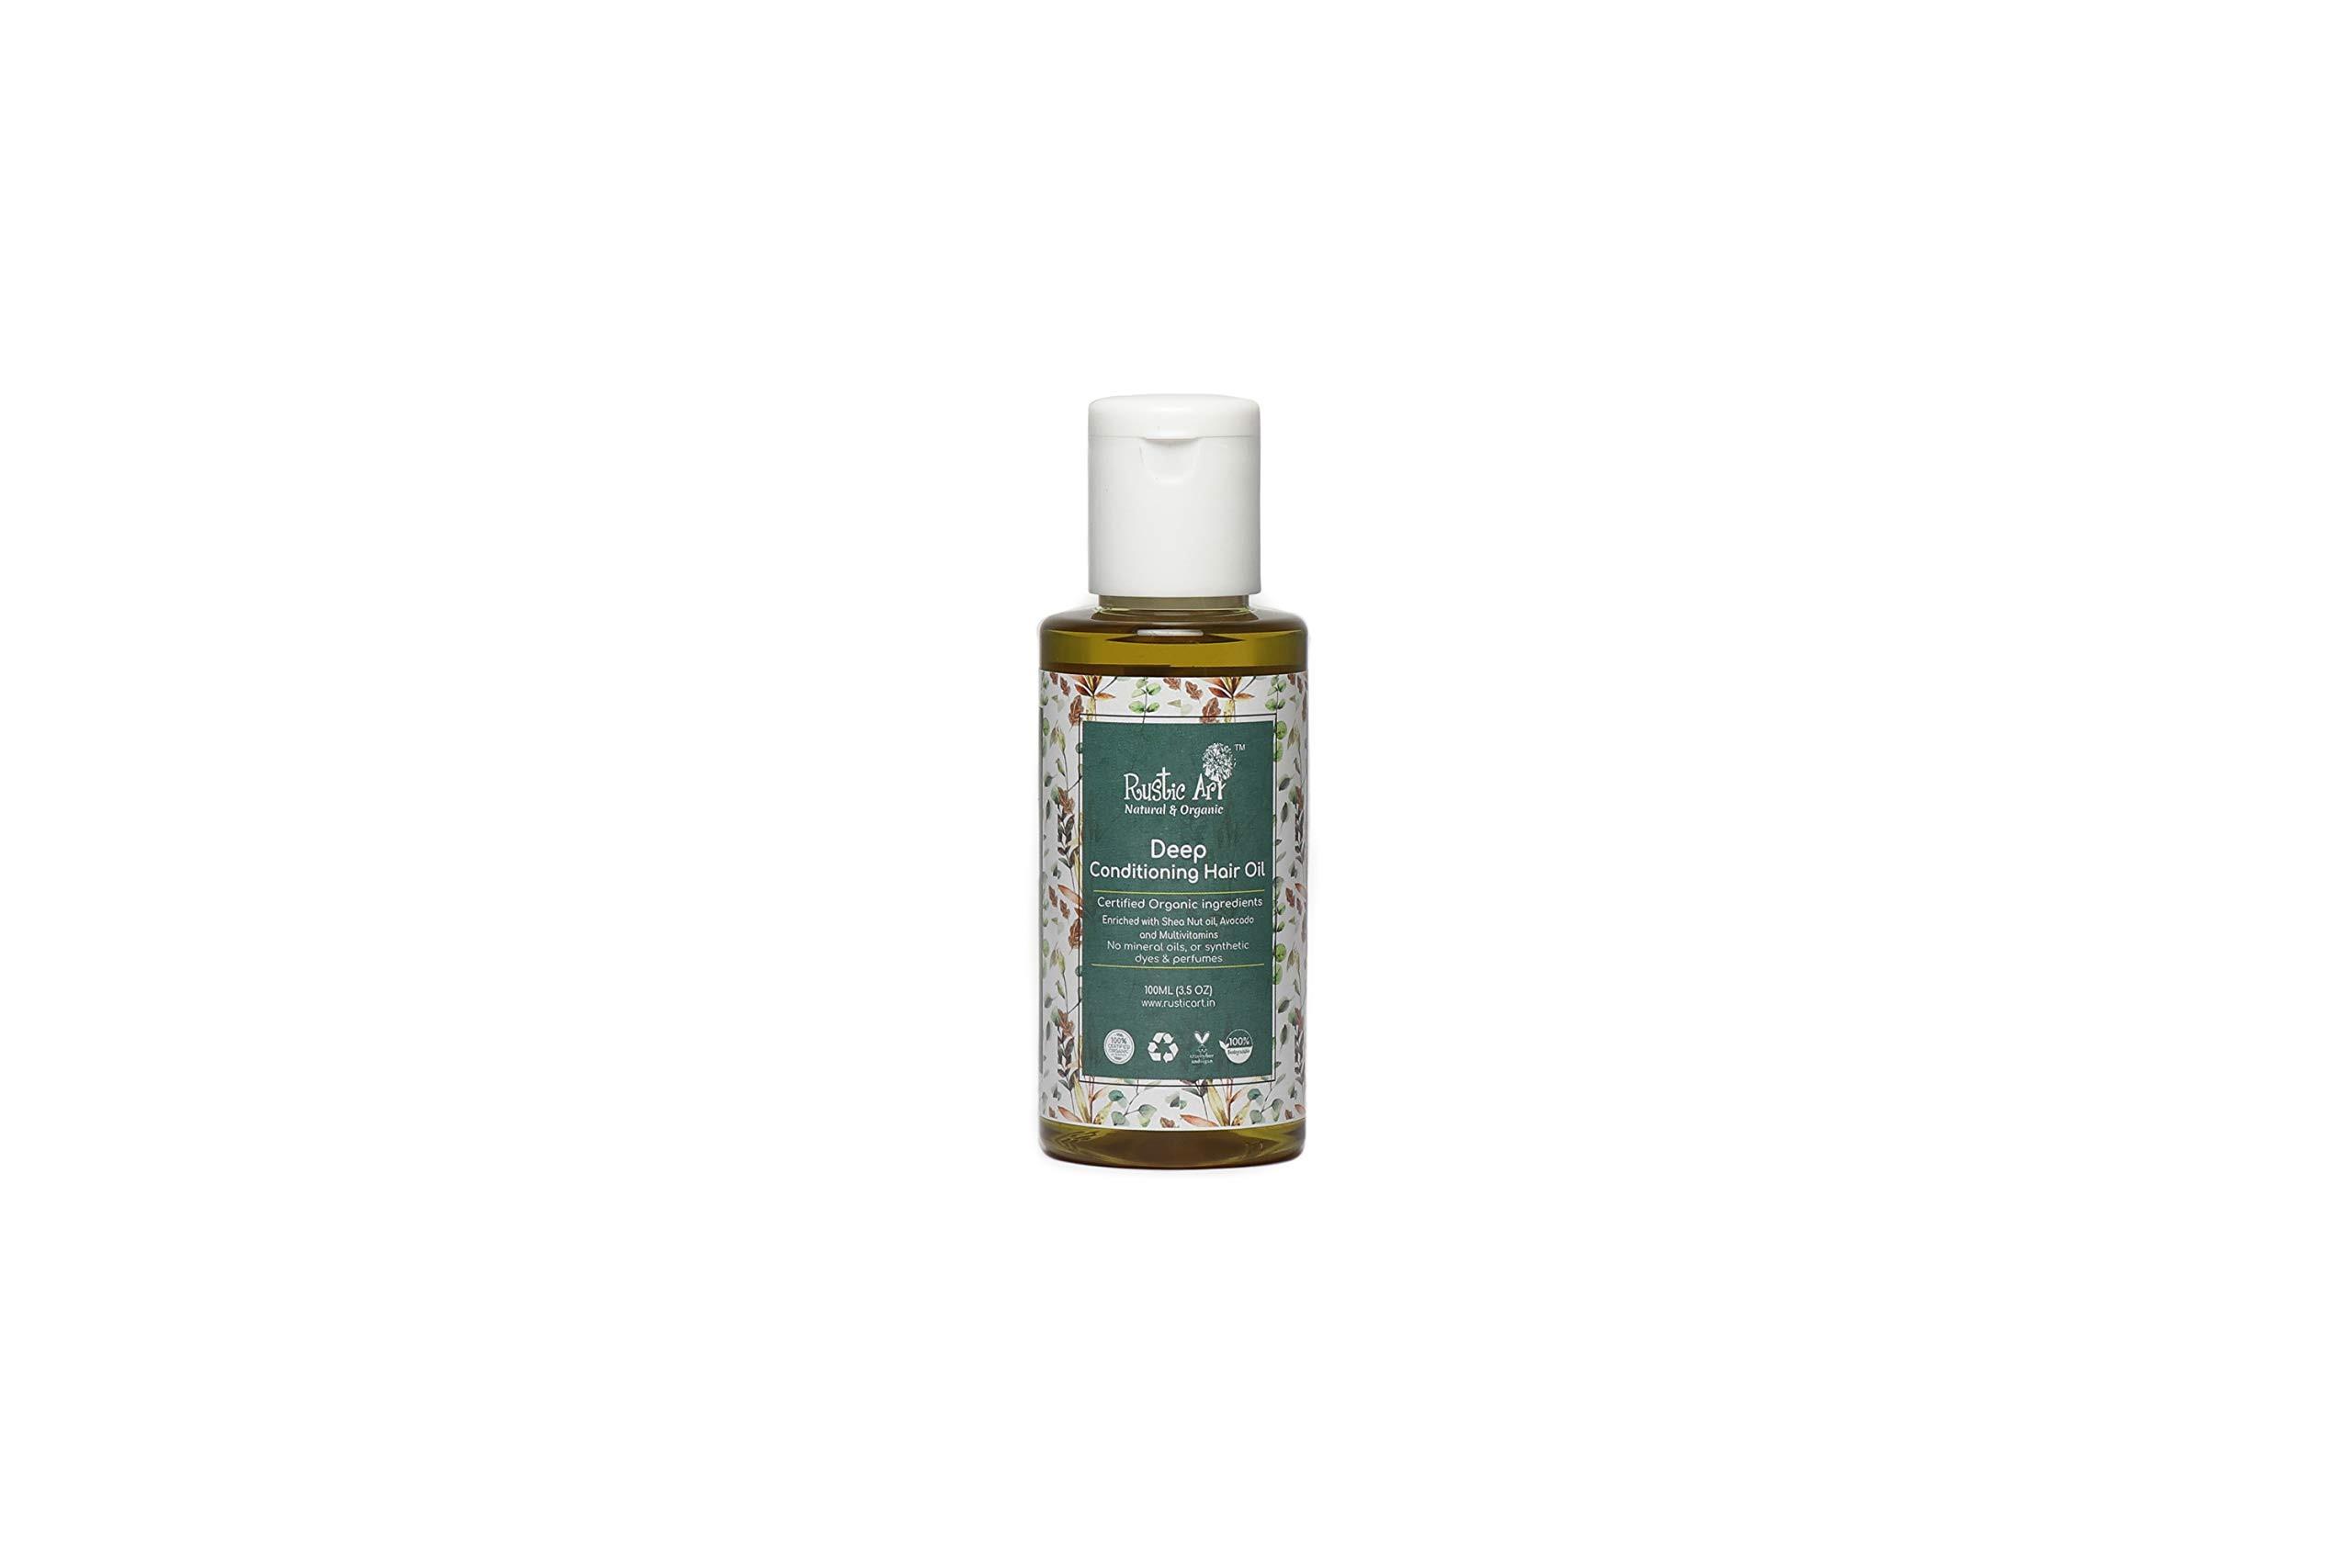 Rustic Art Organic Deep Conditioning Hair Oil, 100 Ml